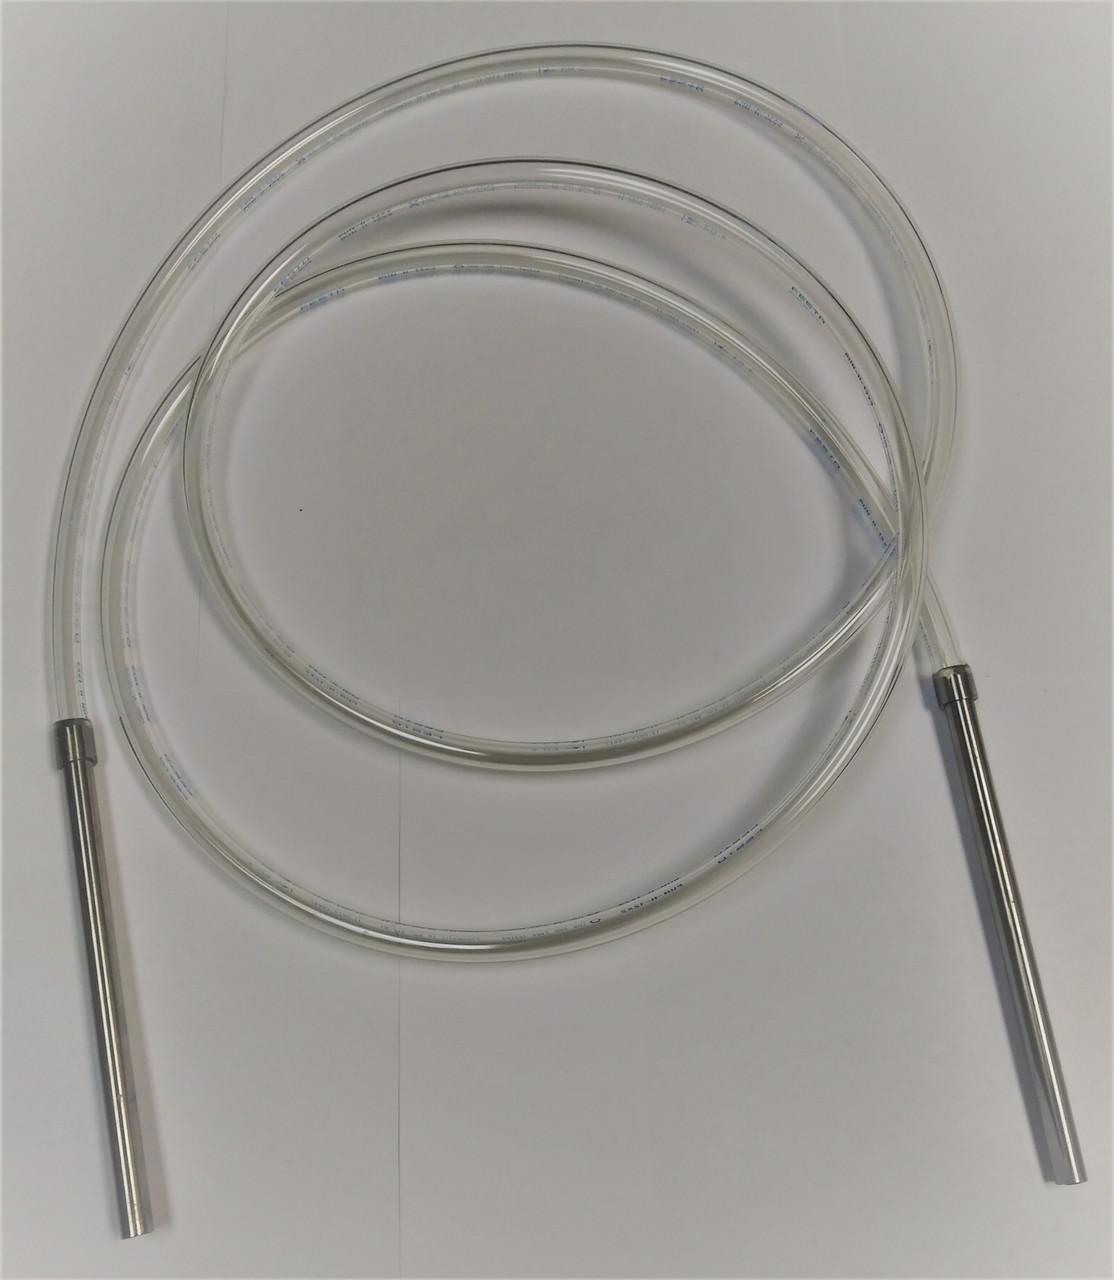 C60401 - Screw Tube Hose Assembly